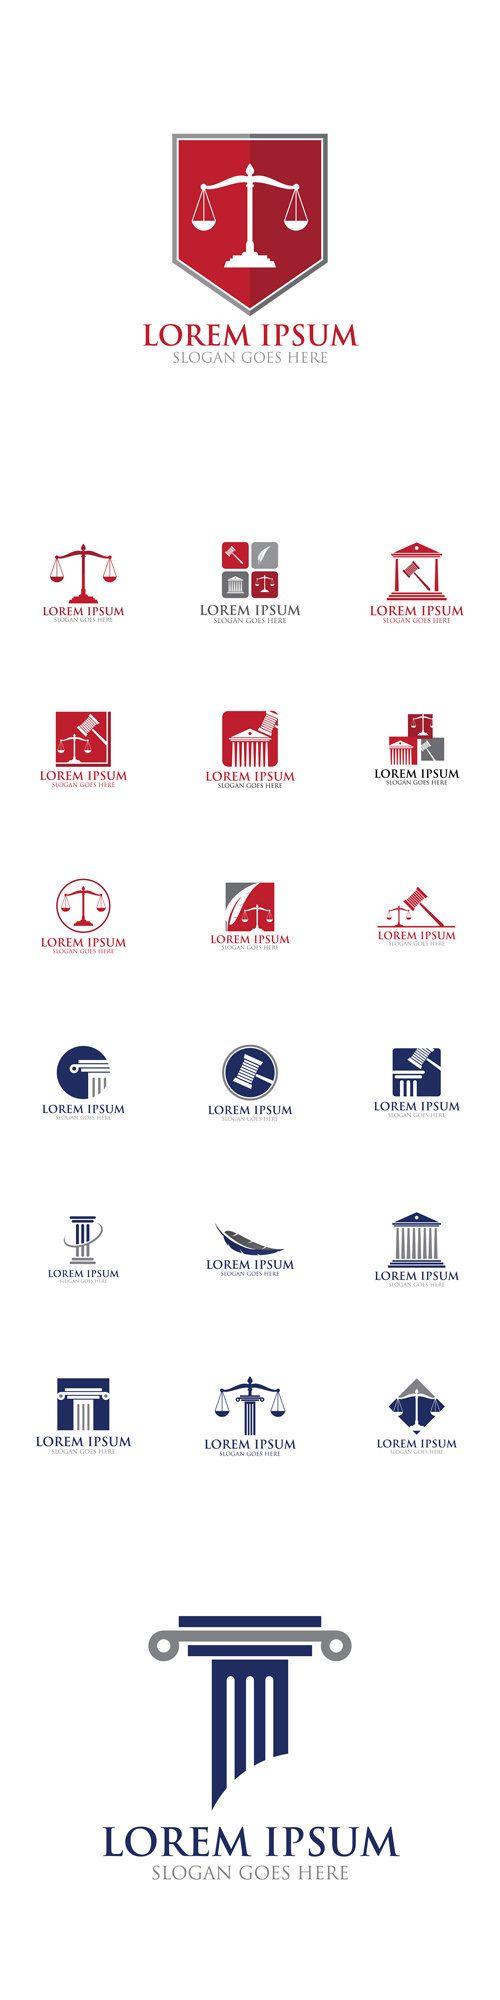 Vectors - Law Legal Logo Icon Design